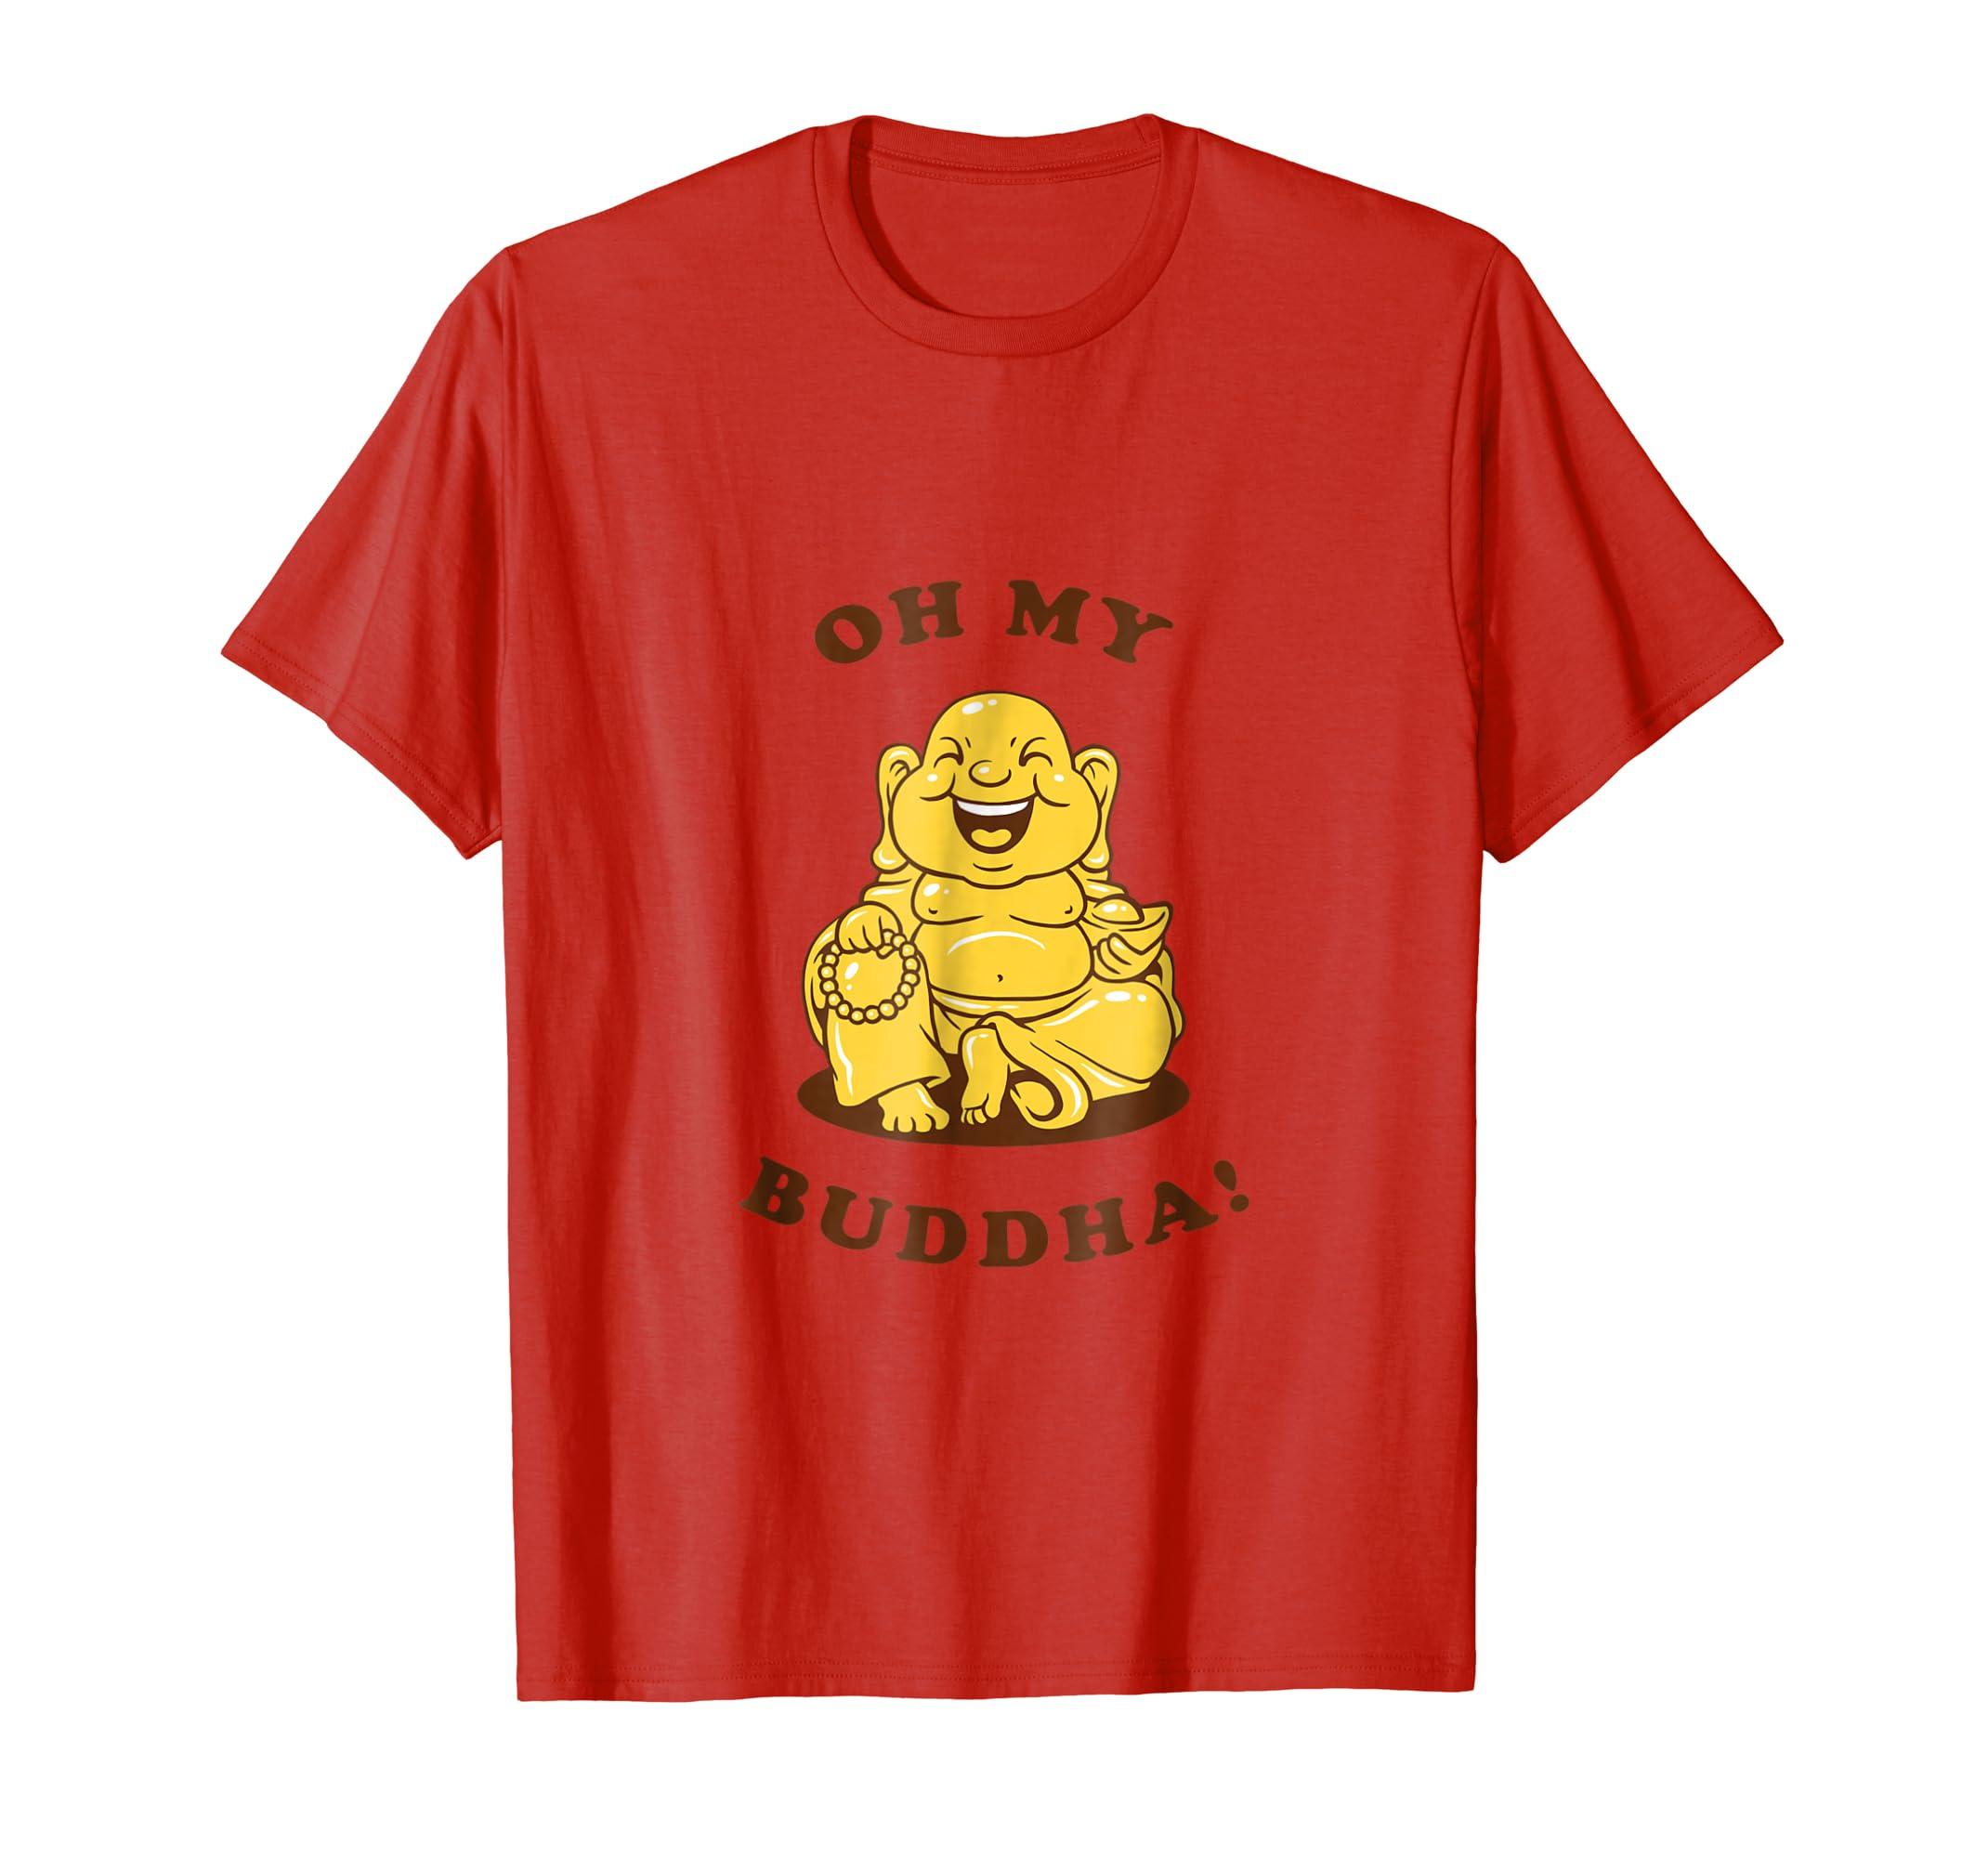 86a816027 Amazon.com: Oh My Buddha T-Shirt - Funny Buddhism God Joke: Clothing